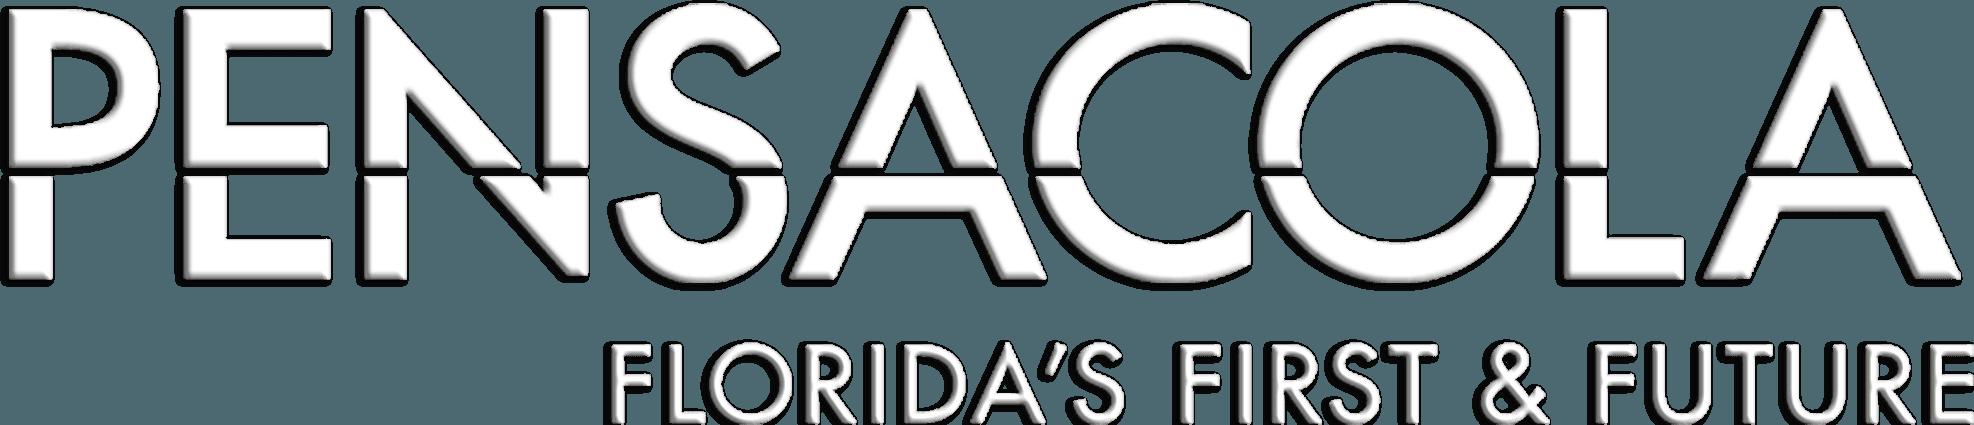 City of Pensacola, Florida Official Website | Official Website